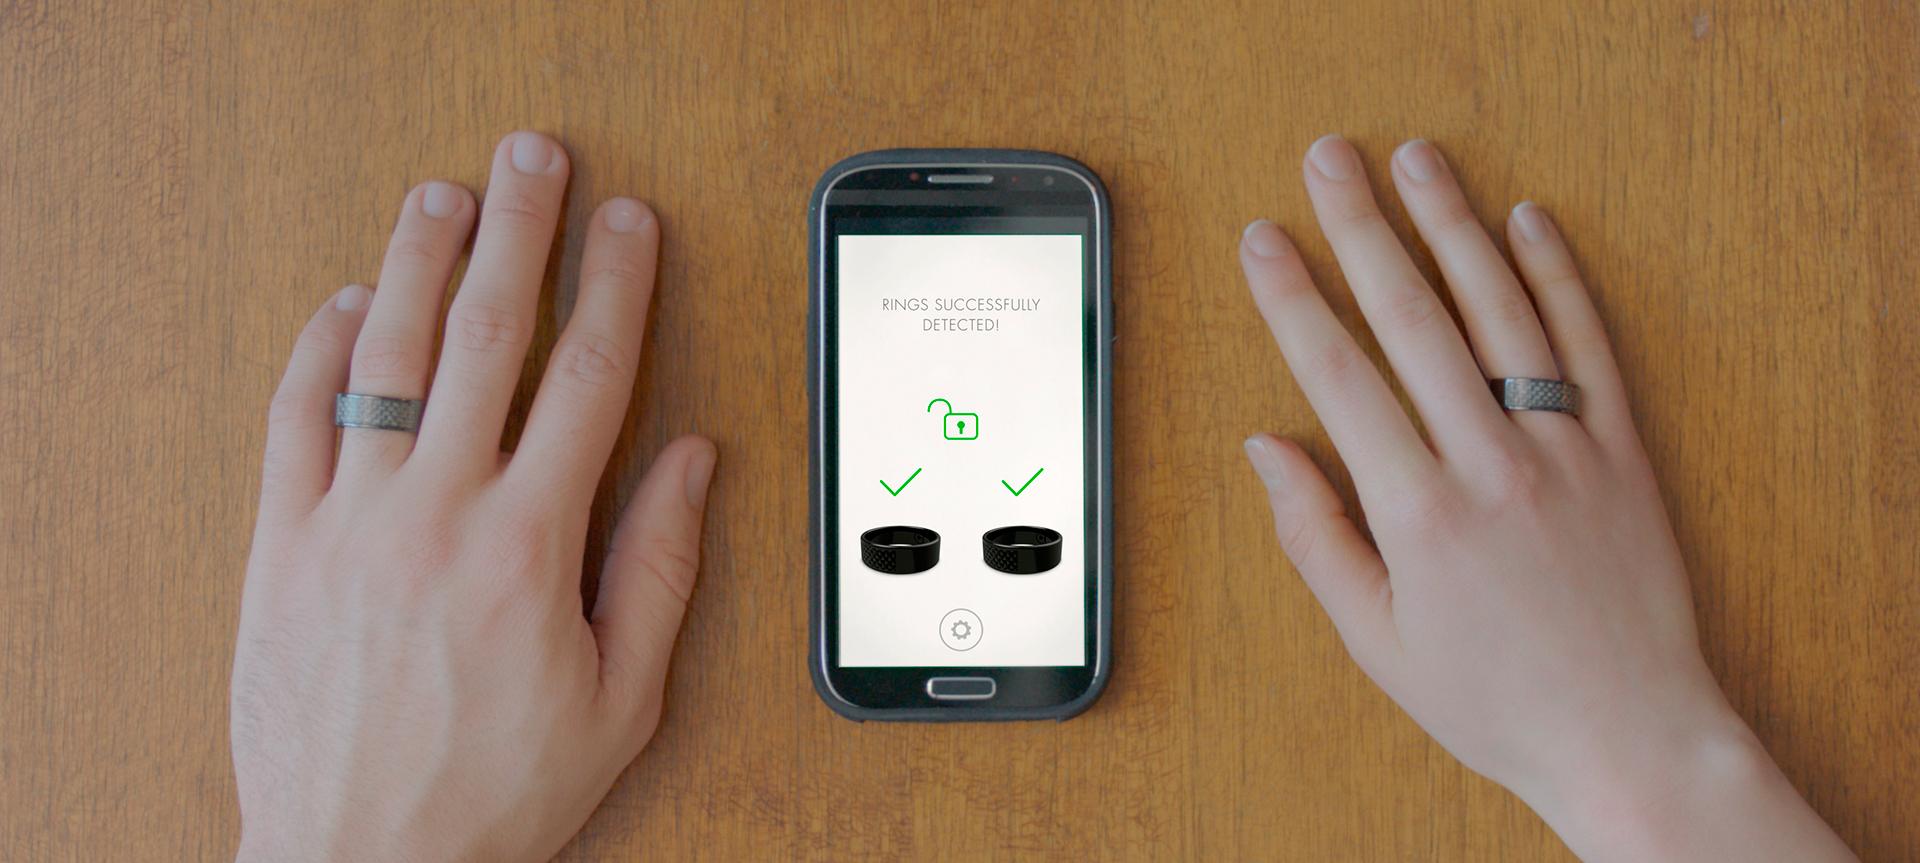 Cornetto Commitment Rings App